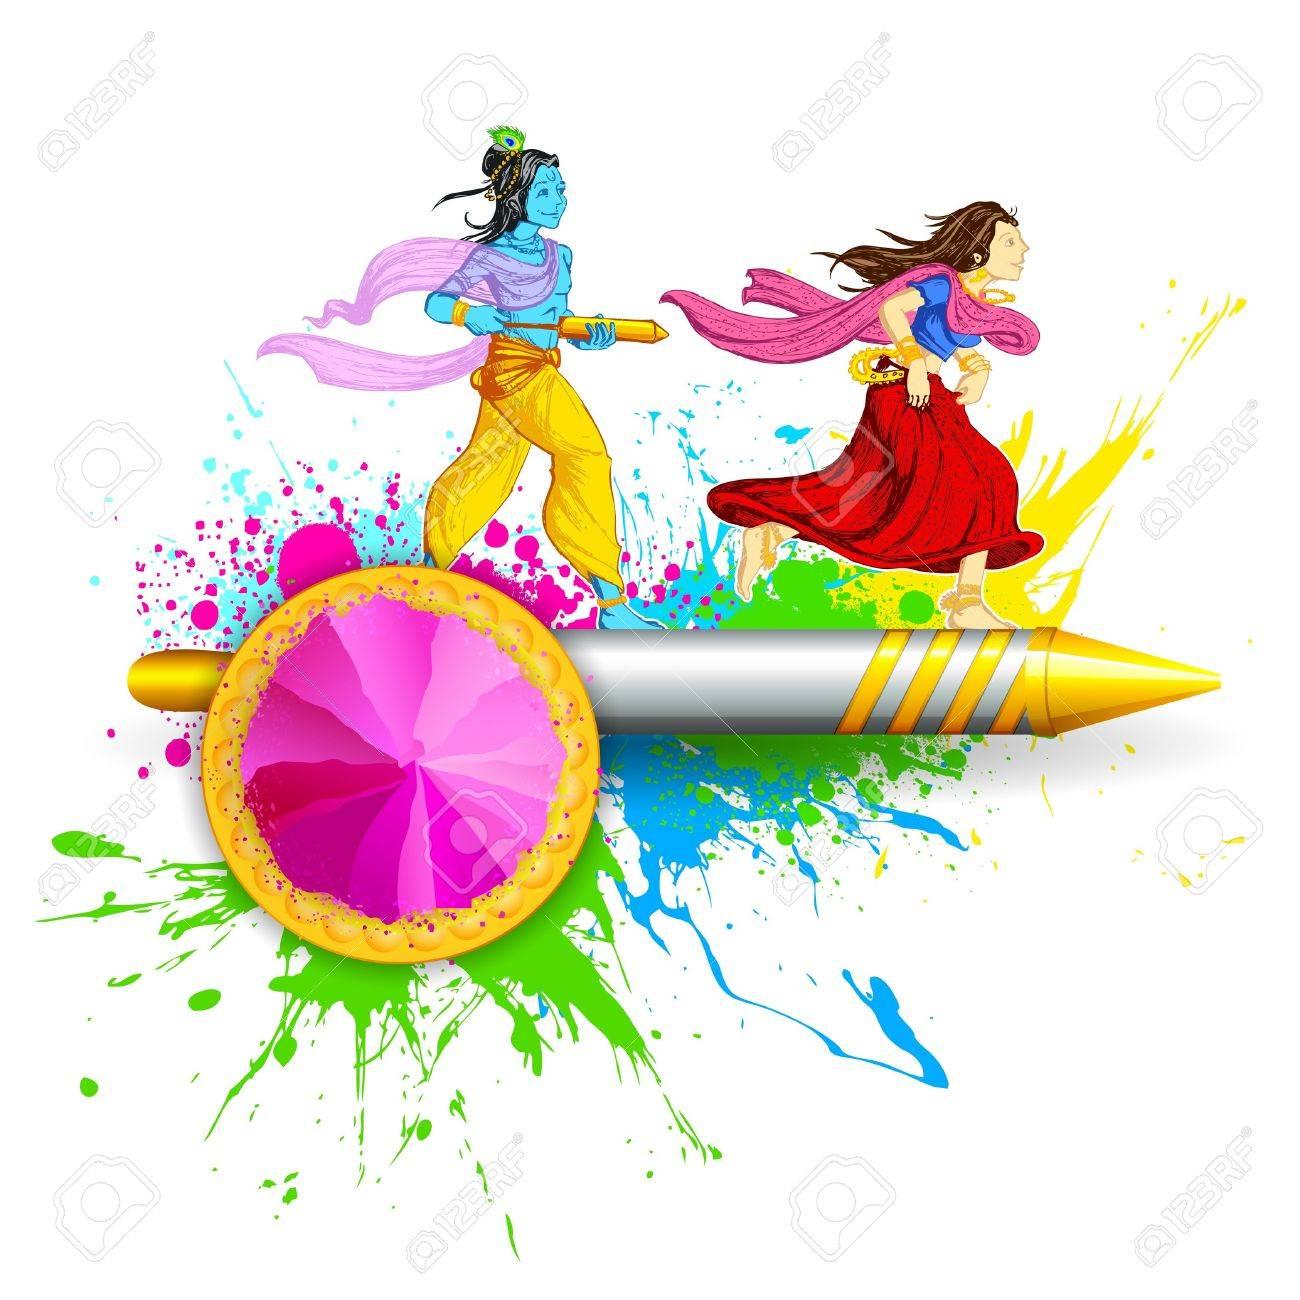 illustration of Radha and Lord Krishna playing Holi Stock Vector - 18089730